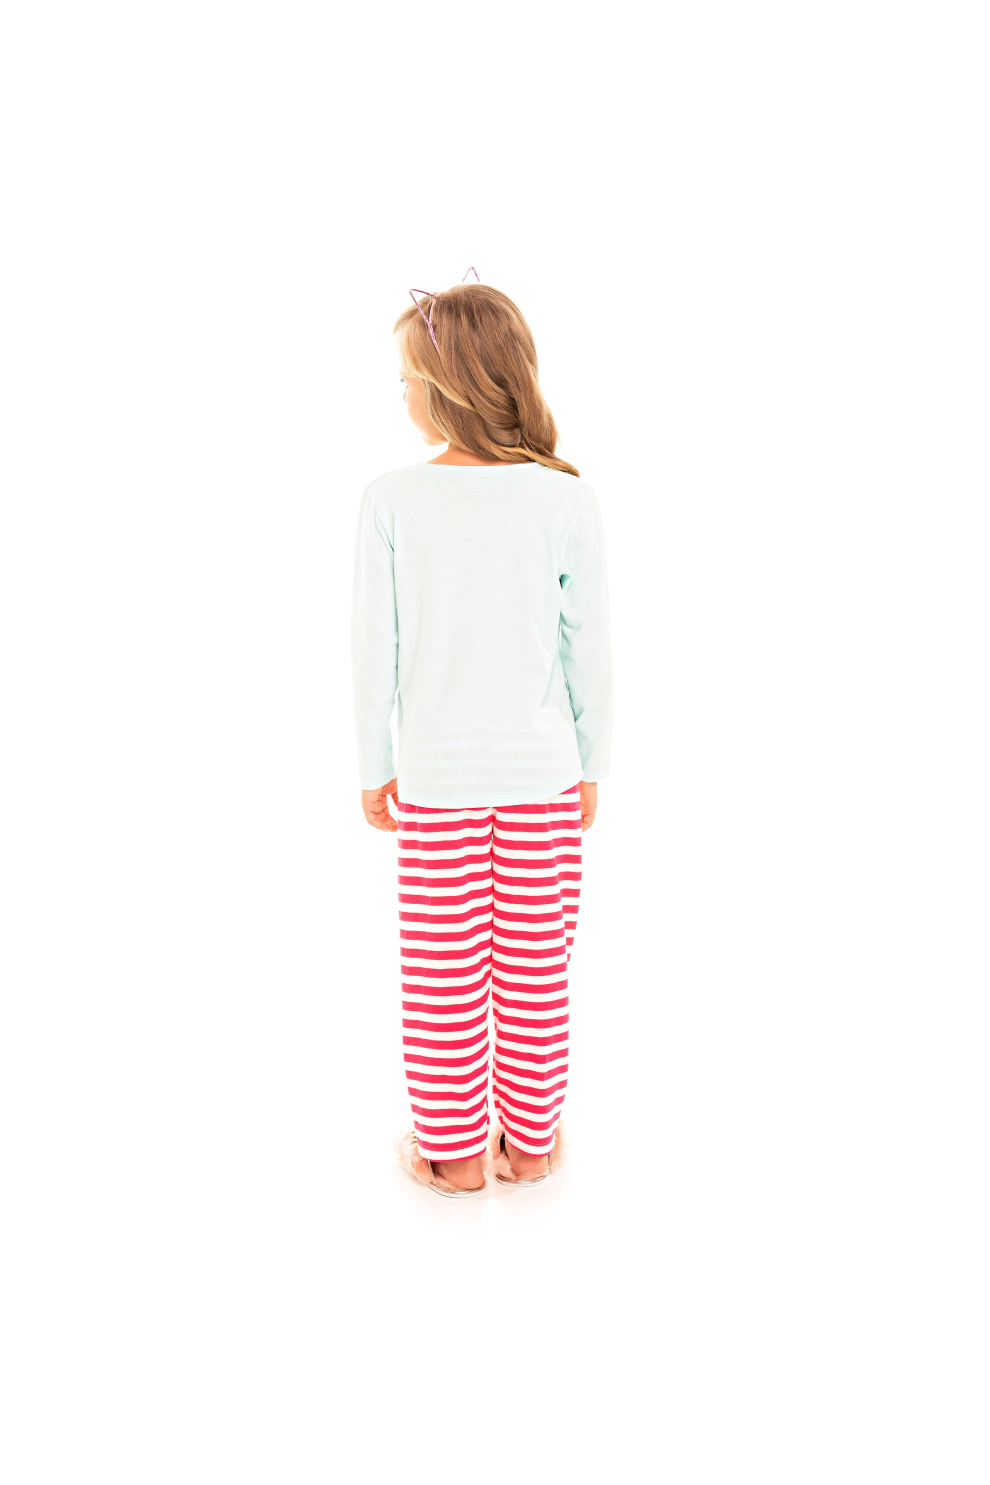 222/C - Pijama Infantil Feminino Together We Are Better